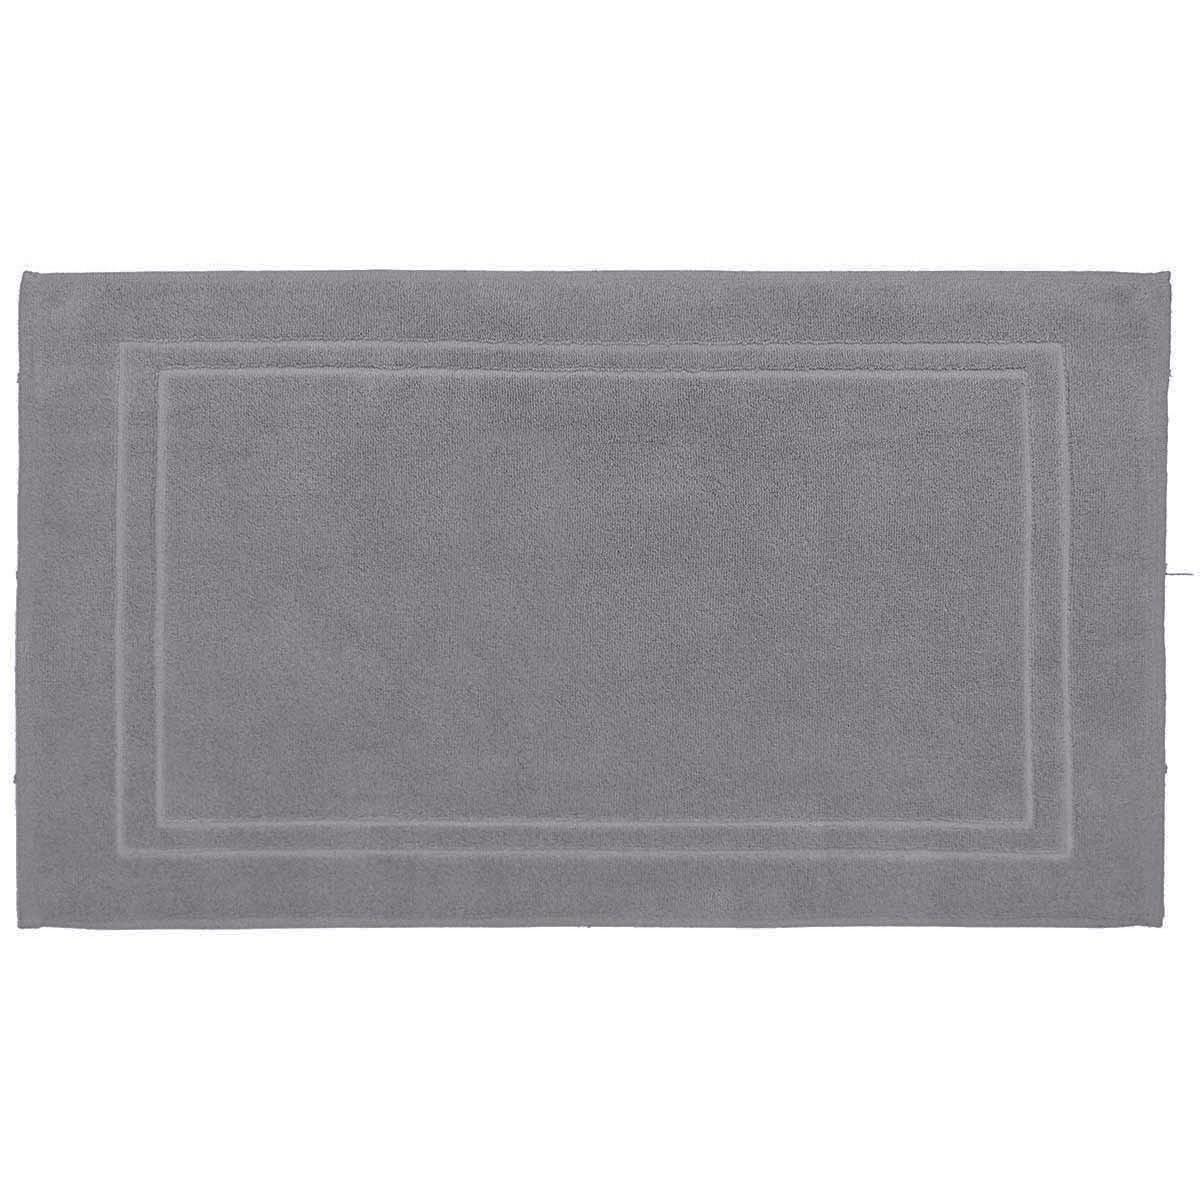 LUXURY - Tapis de bain 900gr/m²  Galet 50x80 cm